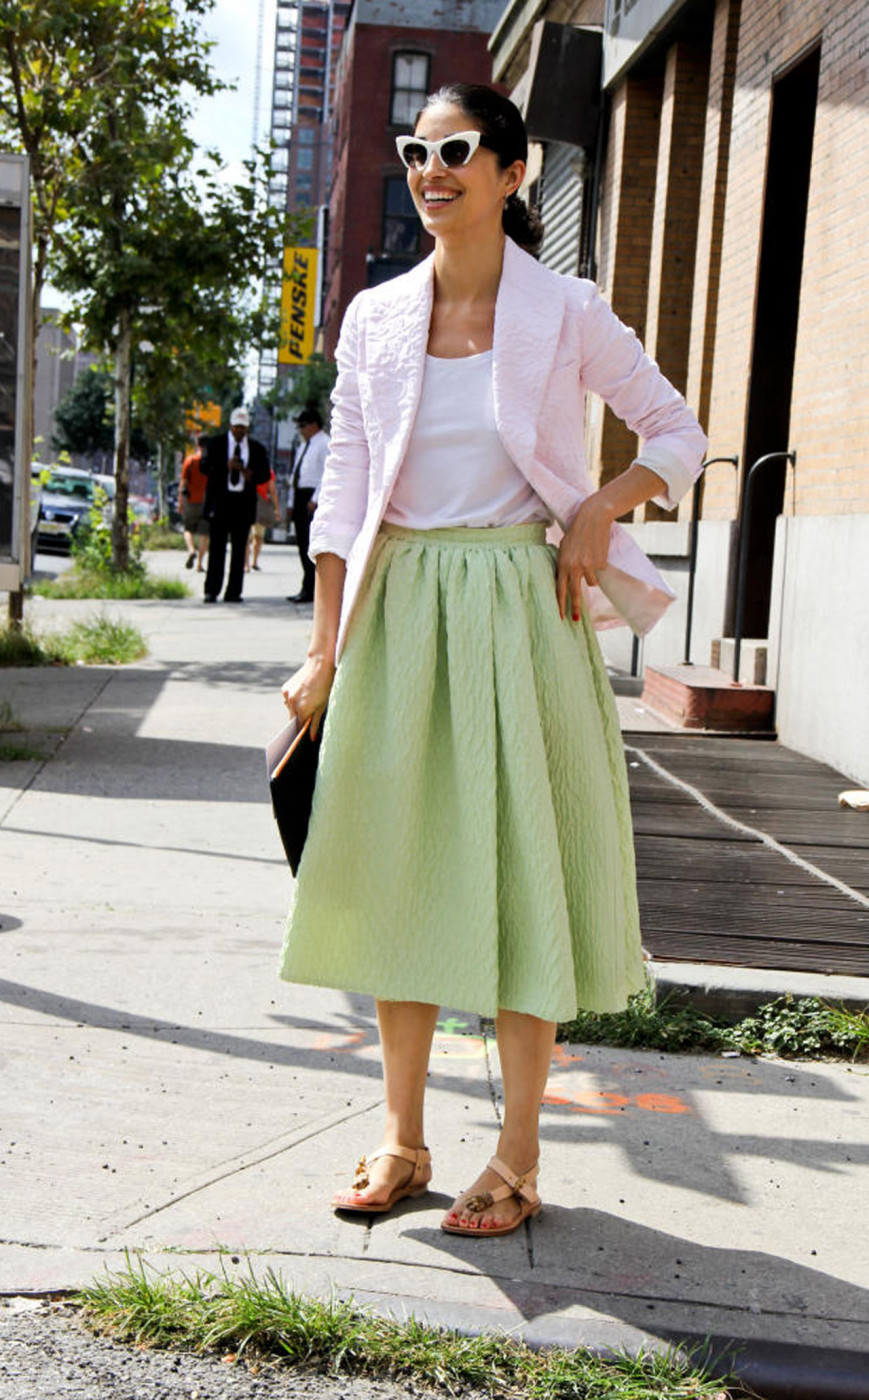 Fashion-Week-Street-Style-SS14-Vintage-Vault-9